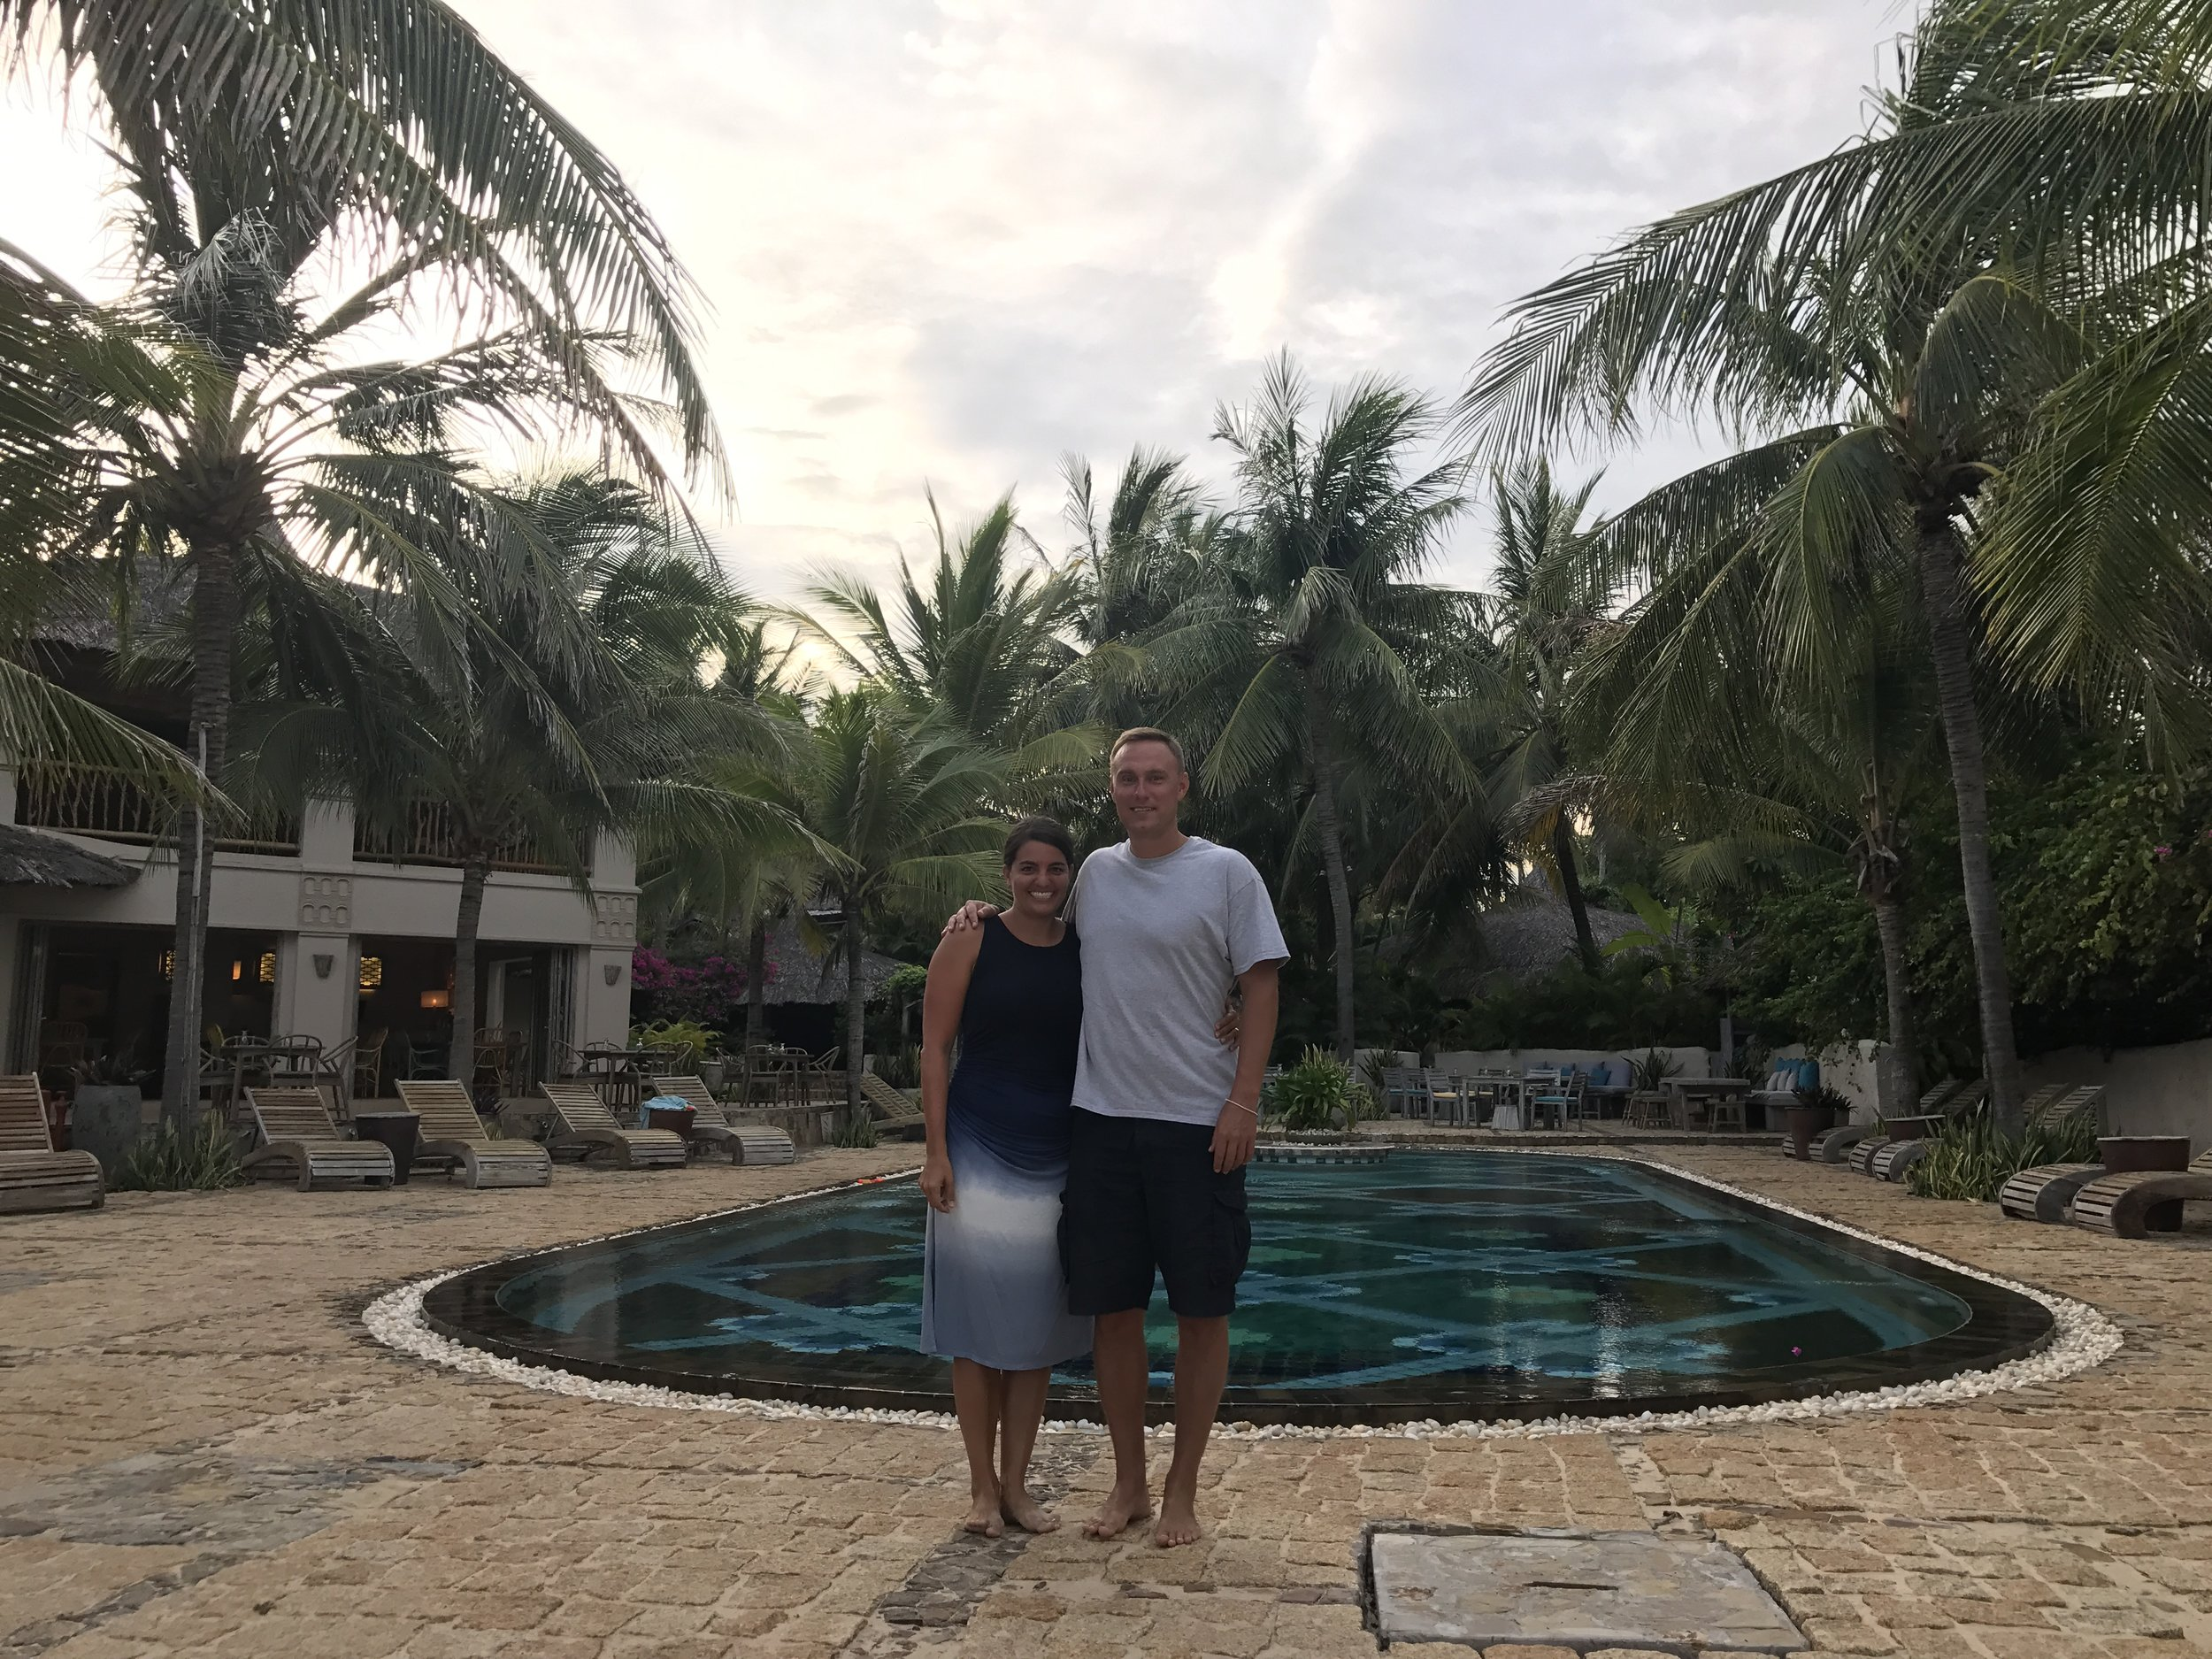 The pool area of our Mui Ne resort